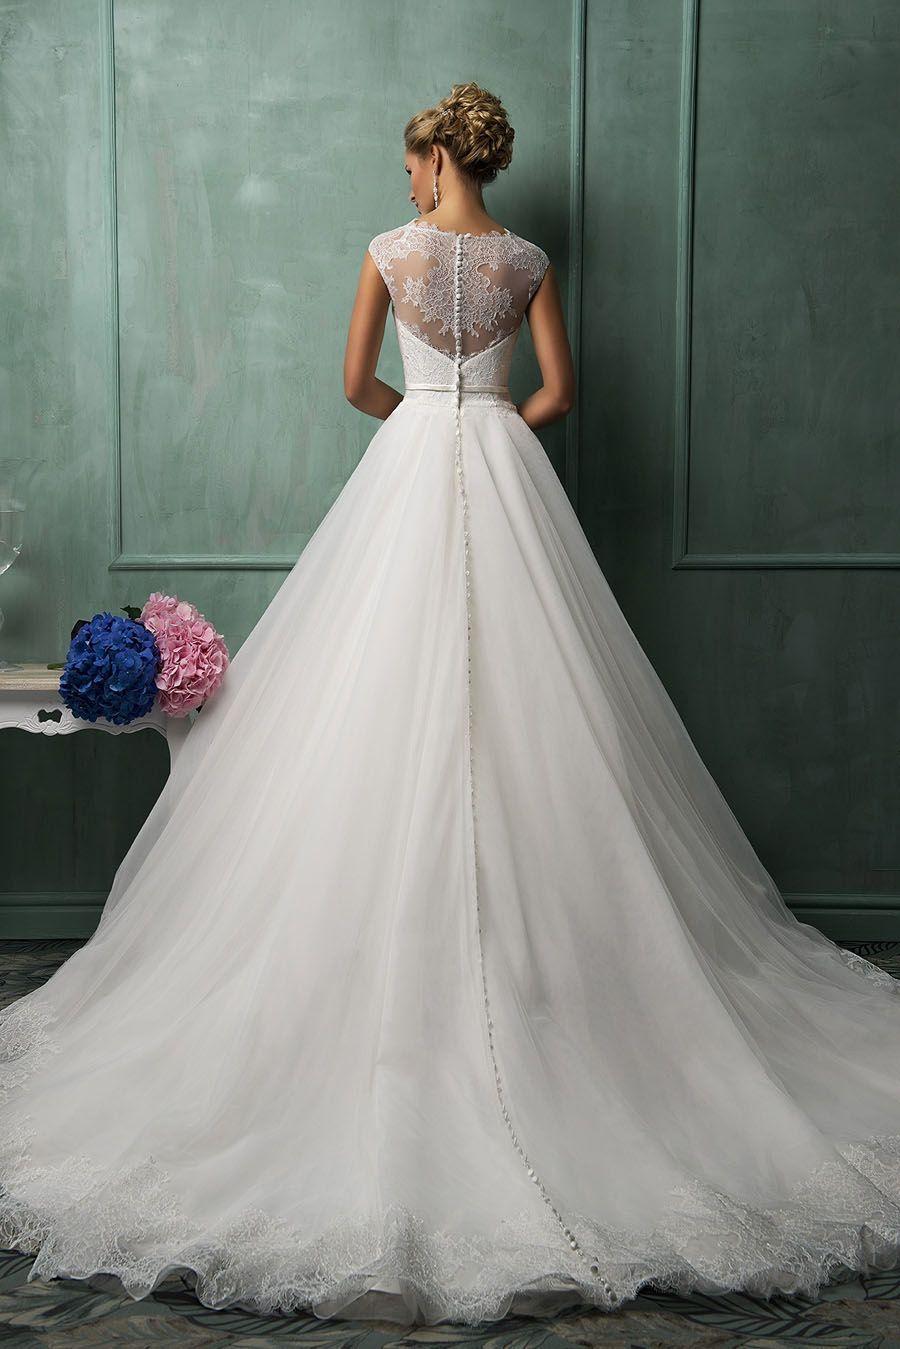 best images about wedding dresses on pinterest boat neck